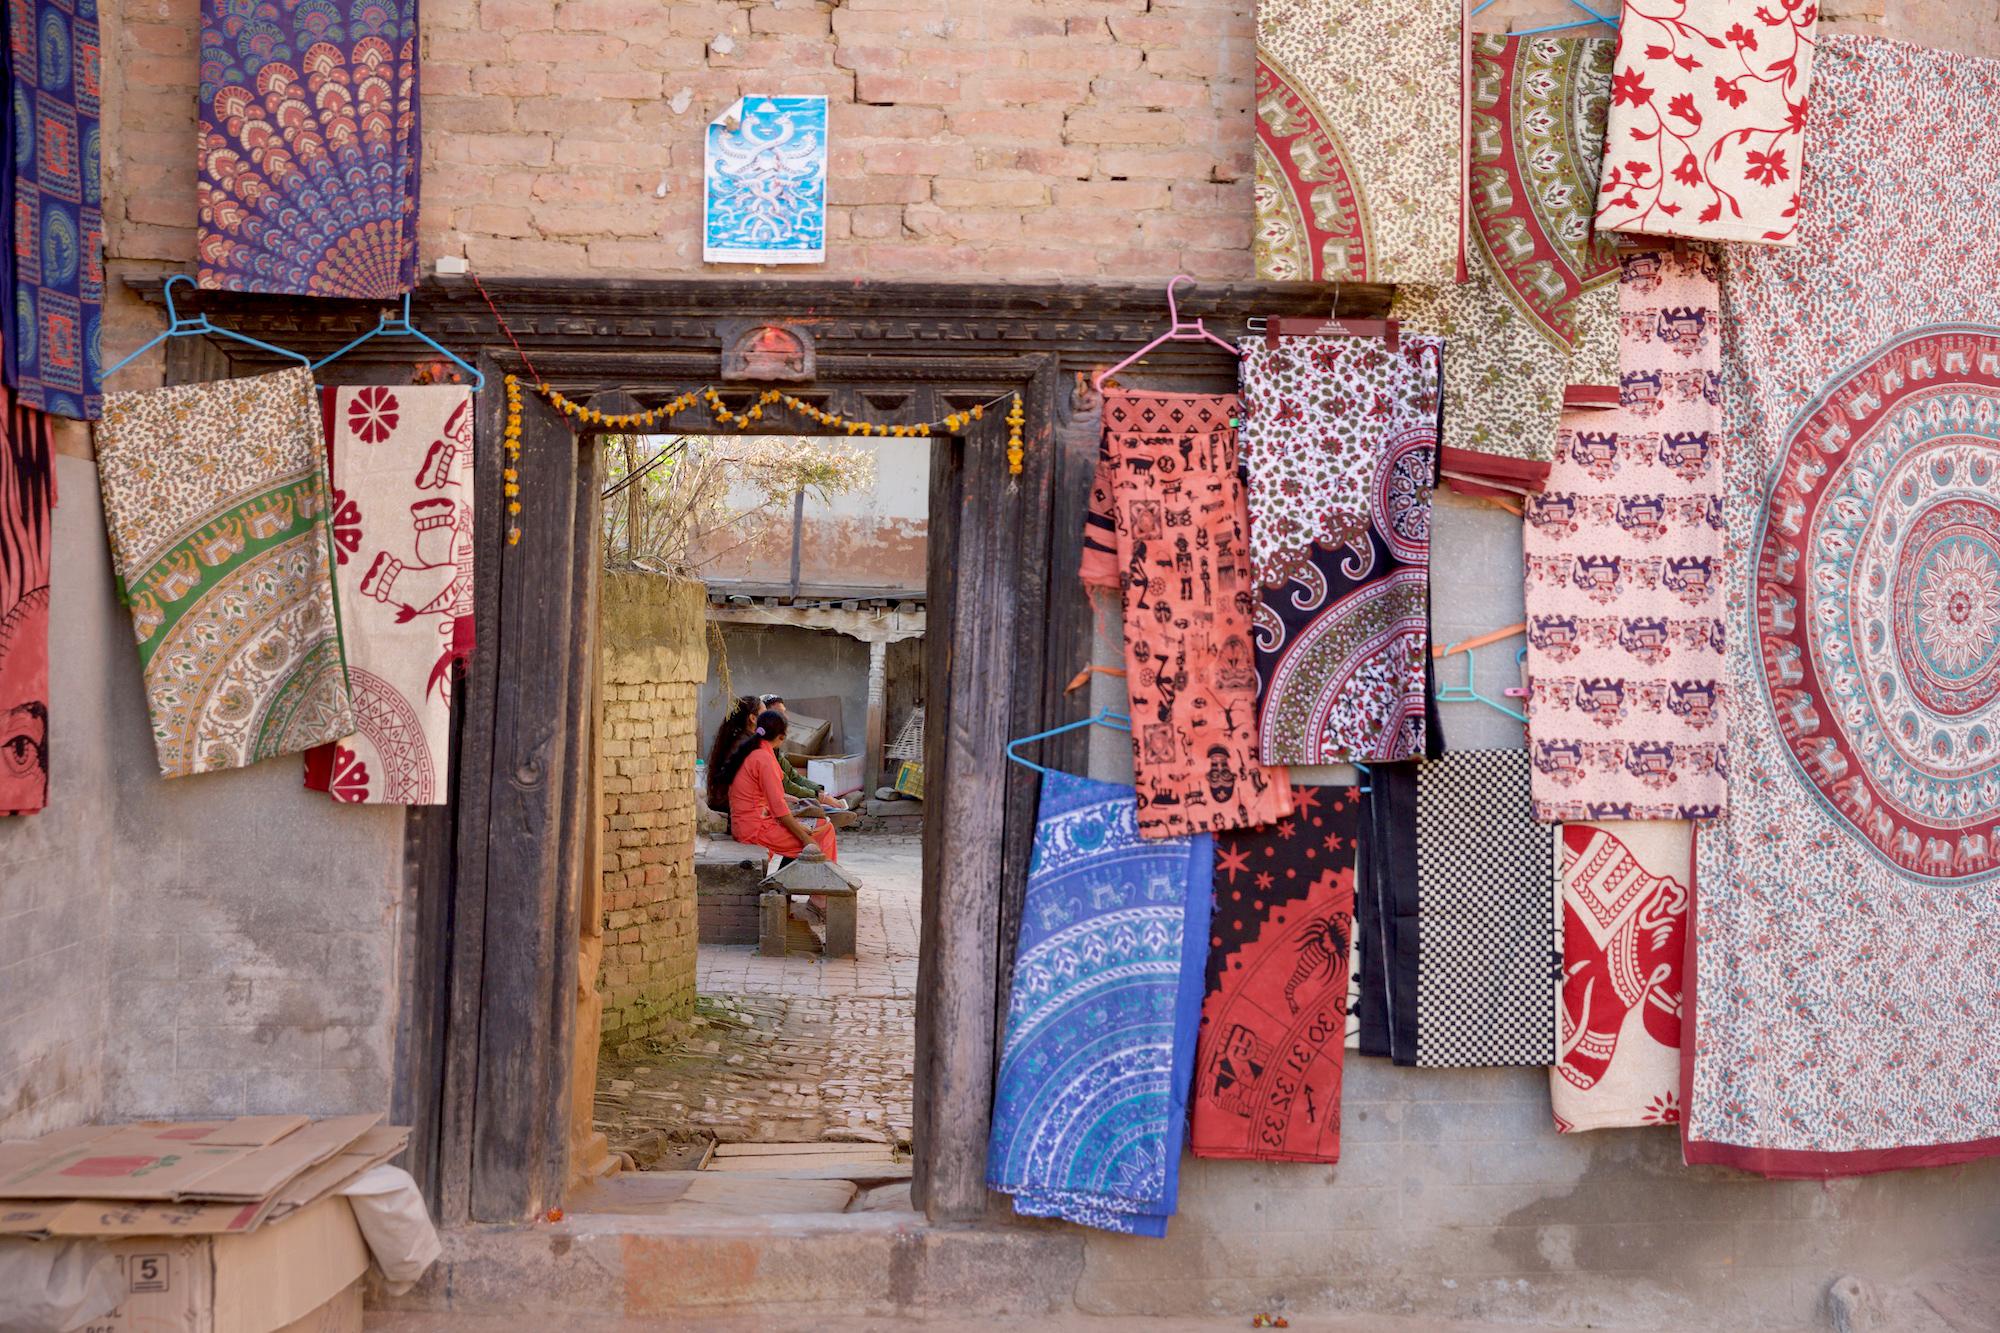 Nepal-Streets-2016- C26O7886.jpg